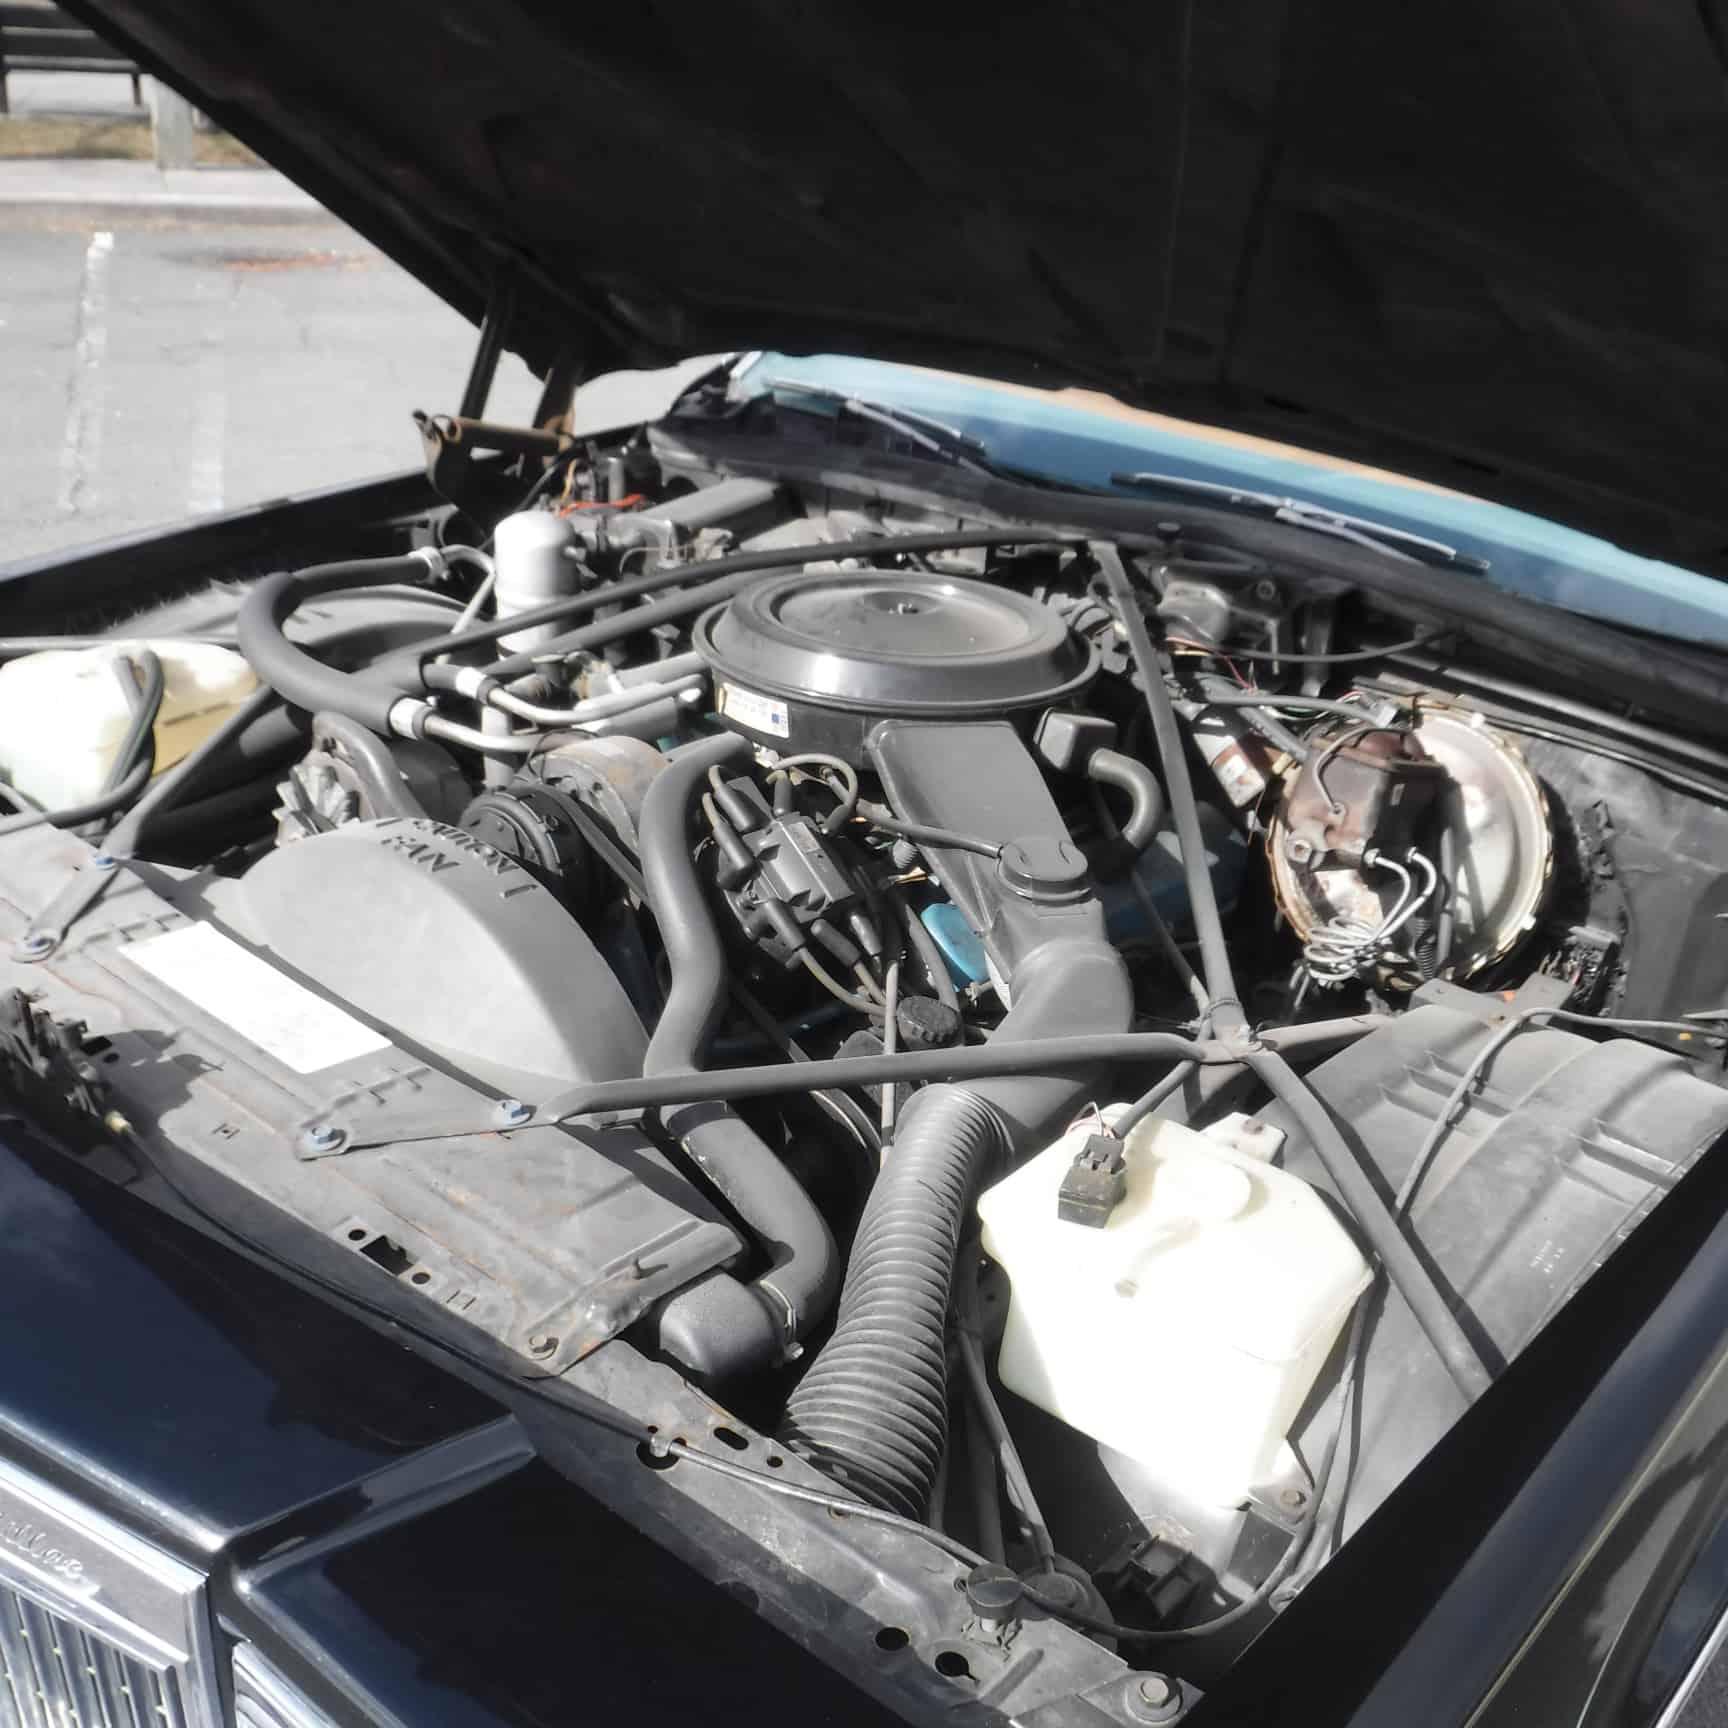 1980 Cadillac 105